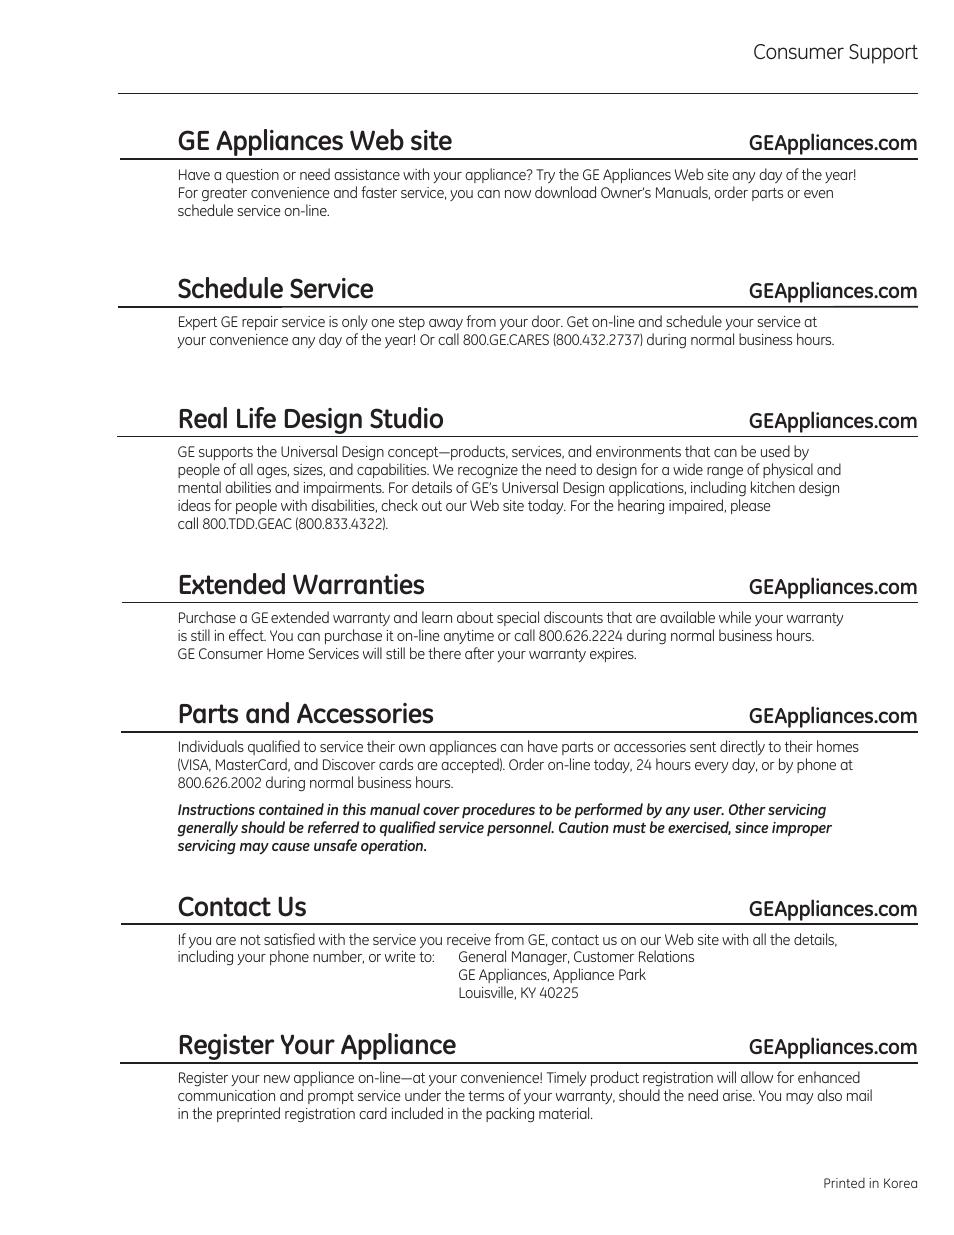 Consumer support, Ge appliances web site, Schedule service